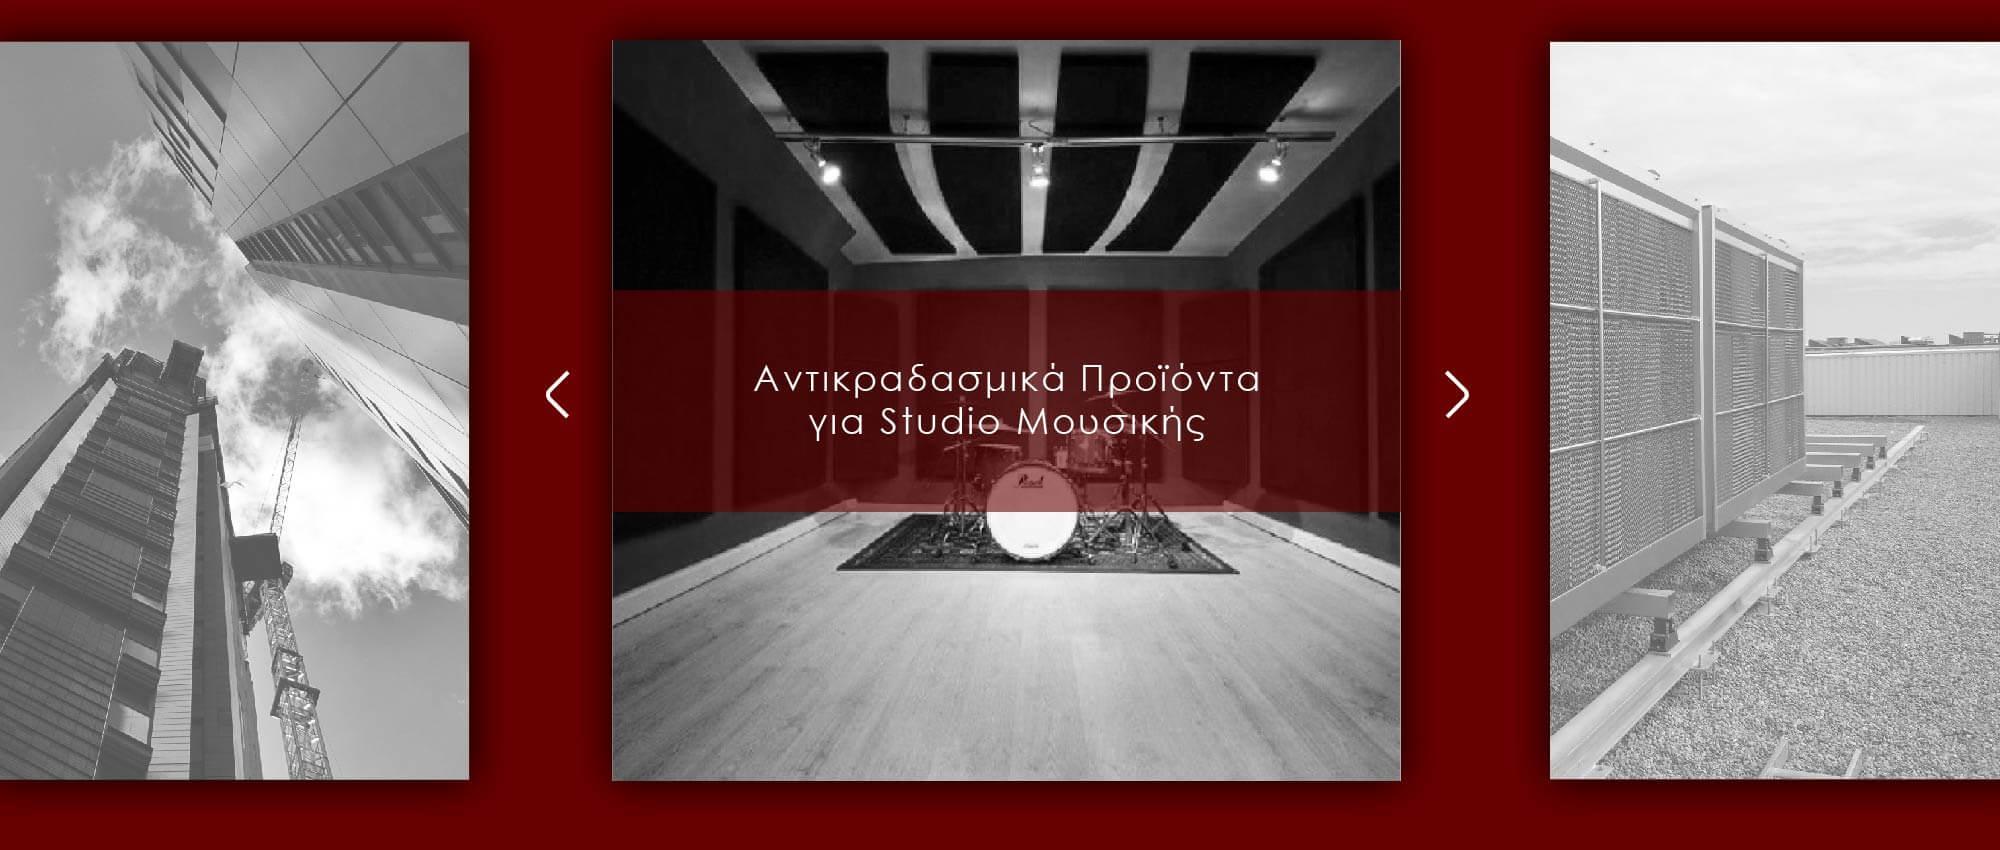 antivibration-systems-Αντικραδασμικά για Studio Μουσικής